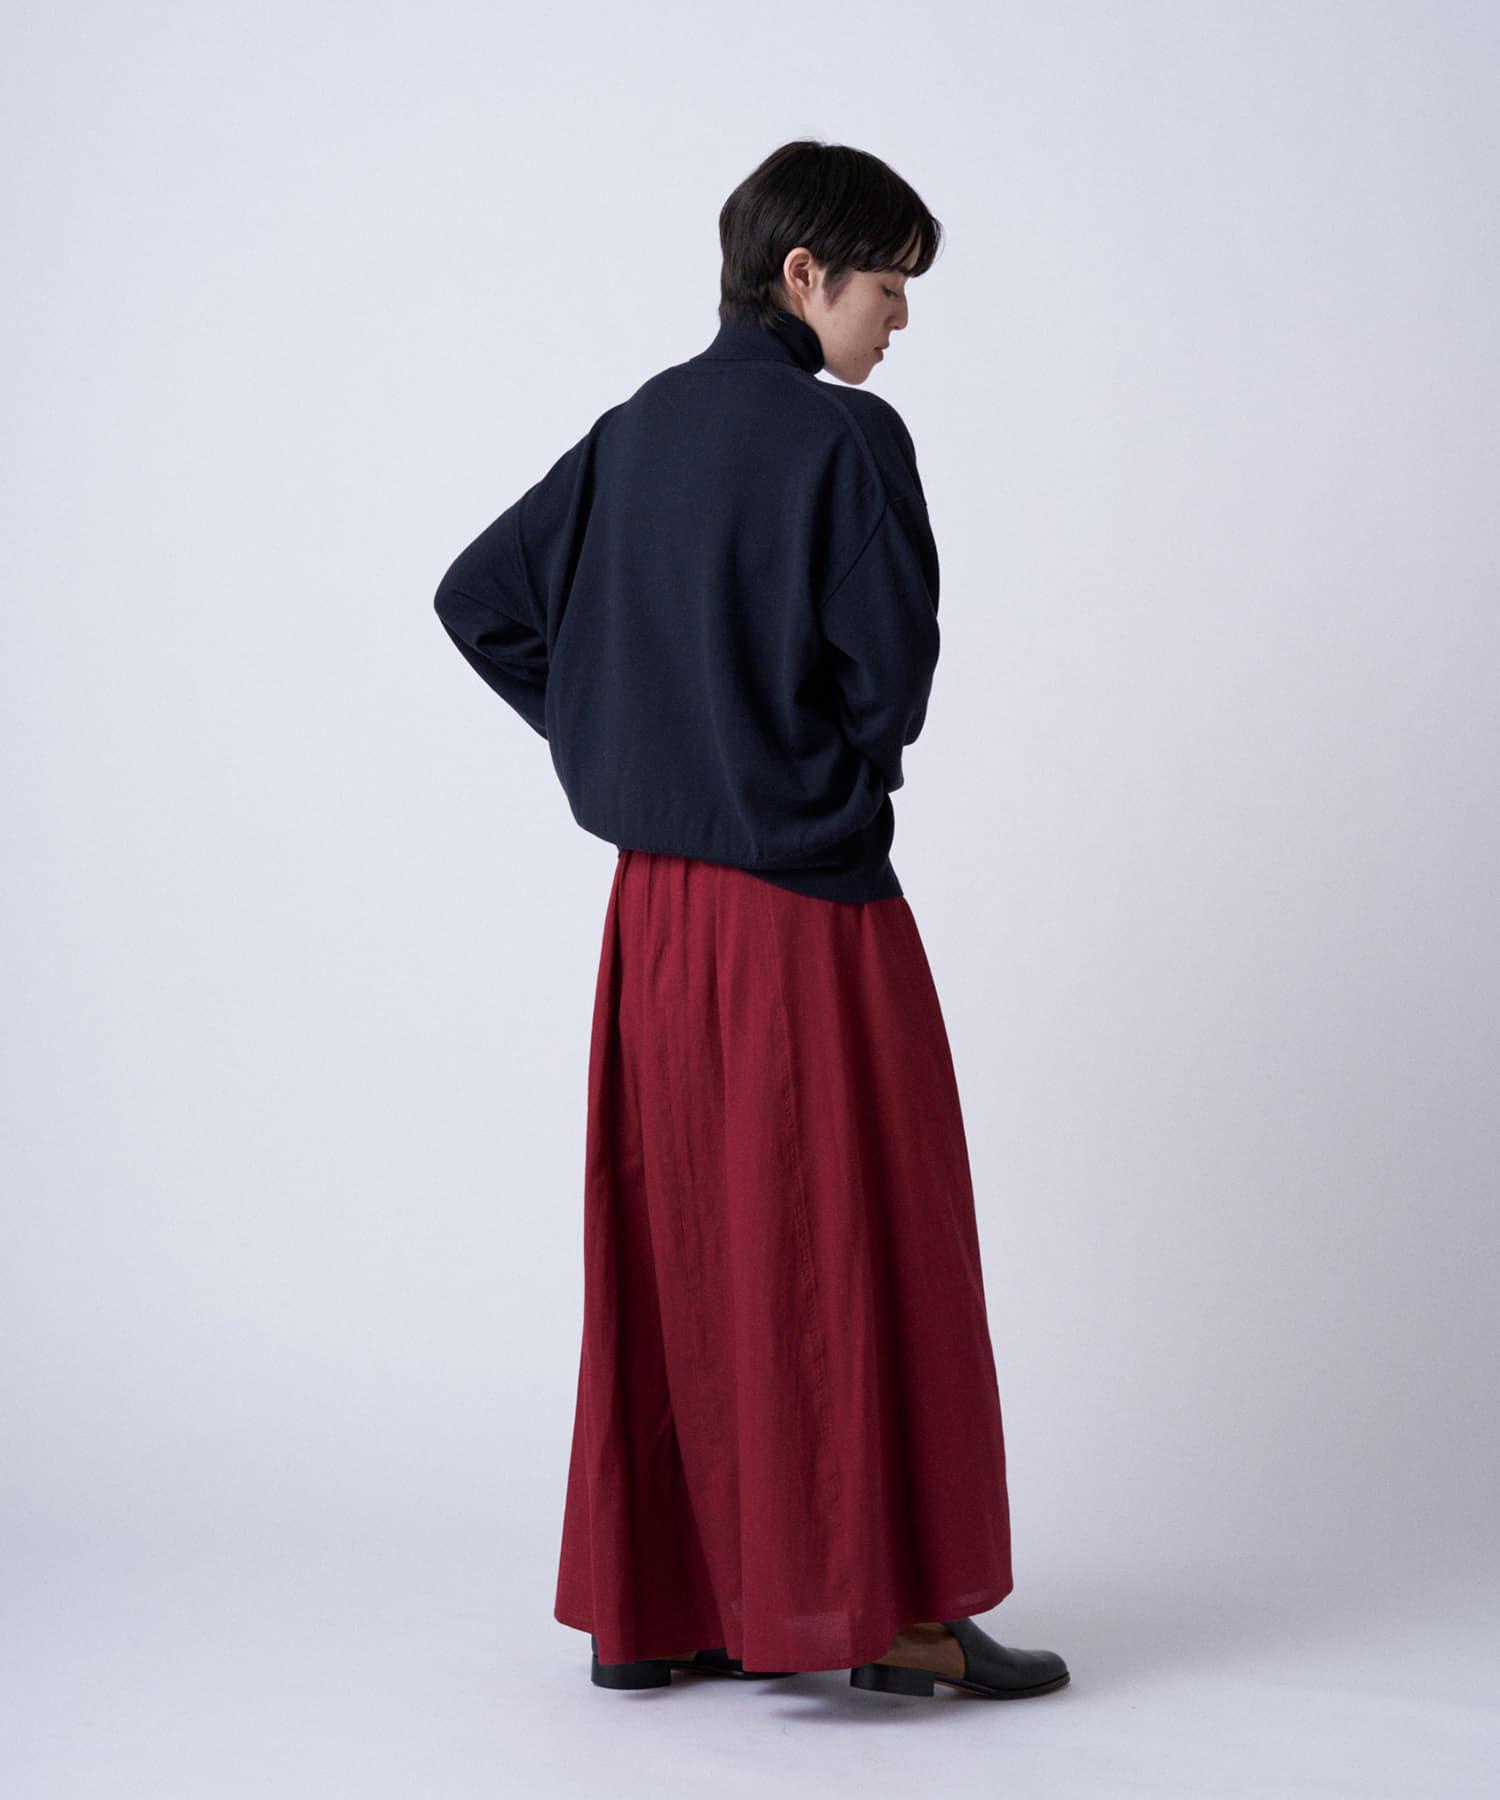 BLOOM&BRANCH(ブルームアンドブランチ) Phlannèl / Cotton Silk Maxi Skirt